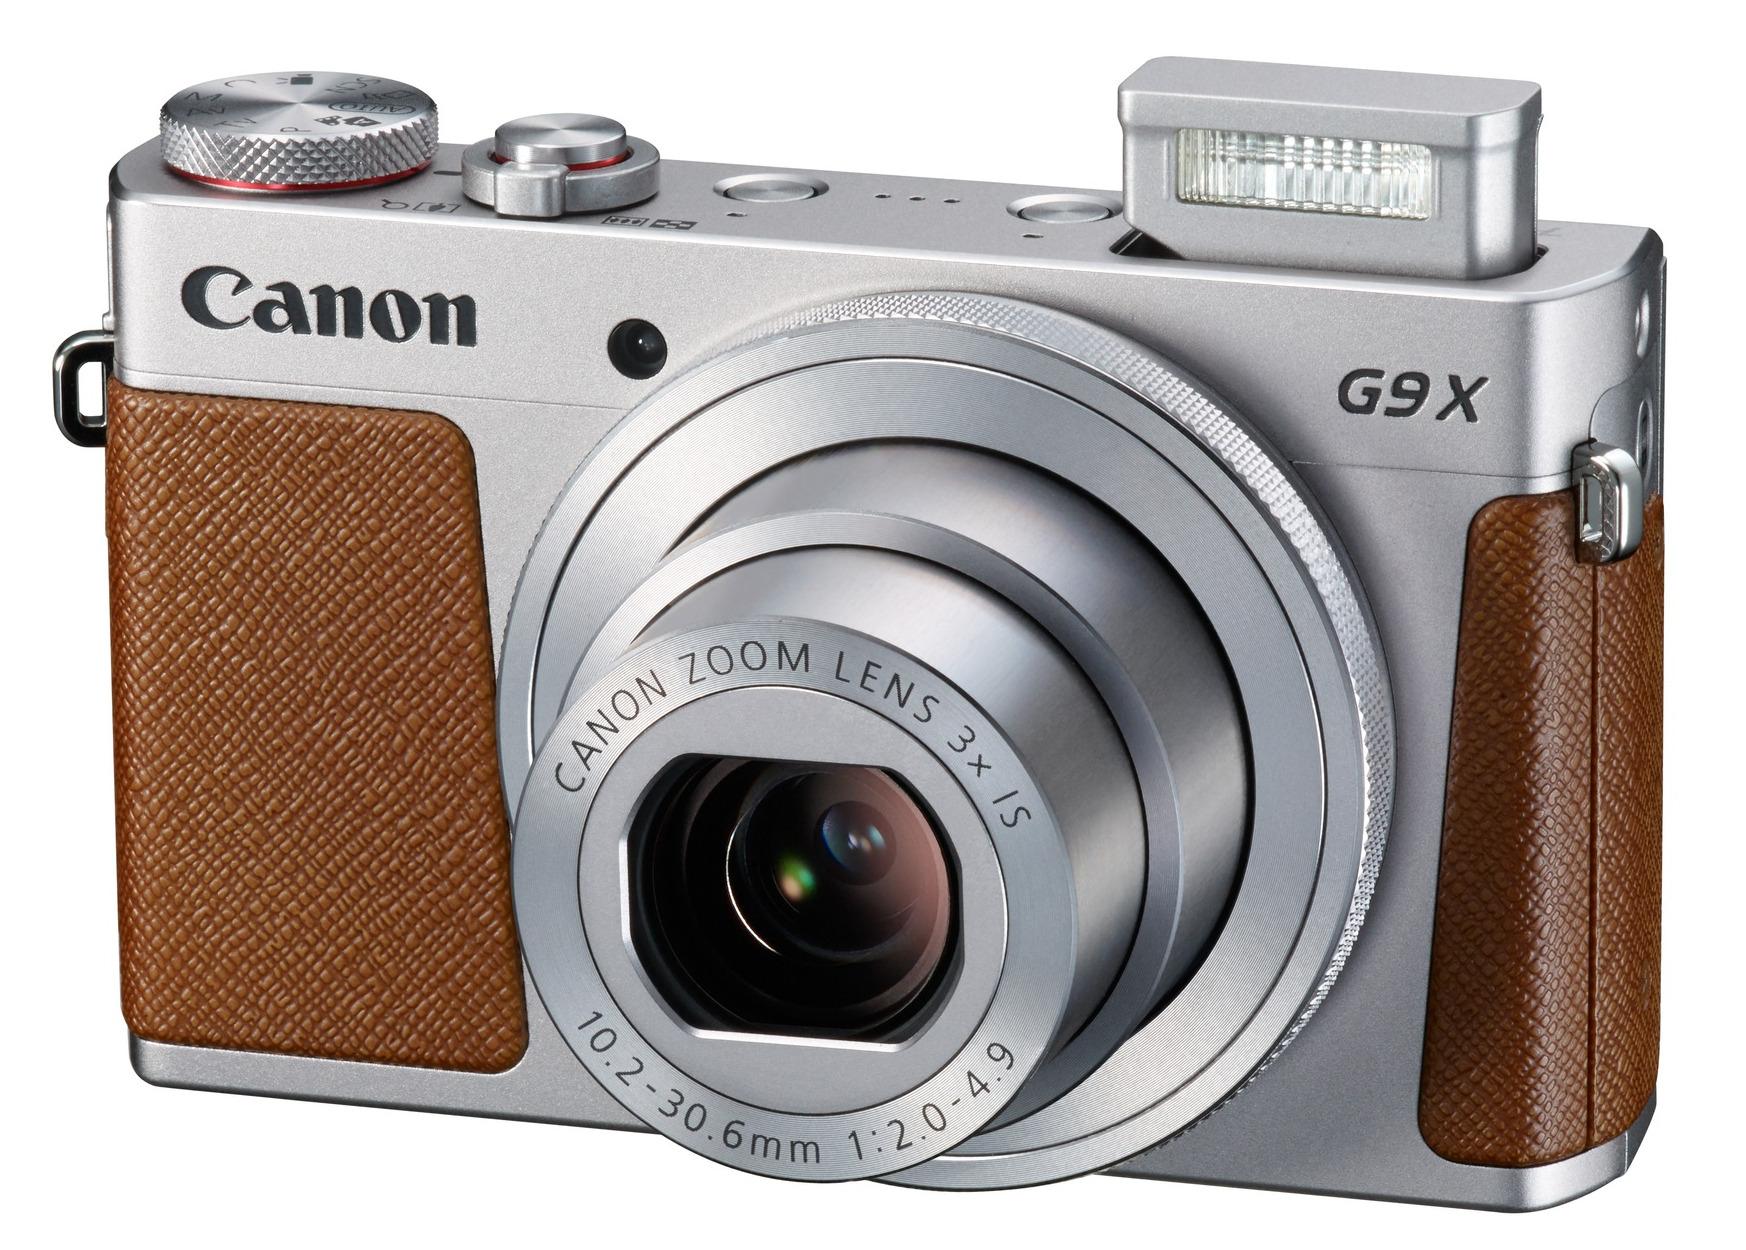 20.1MP Compact Camera in Black or Silver